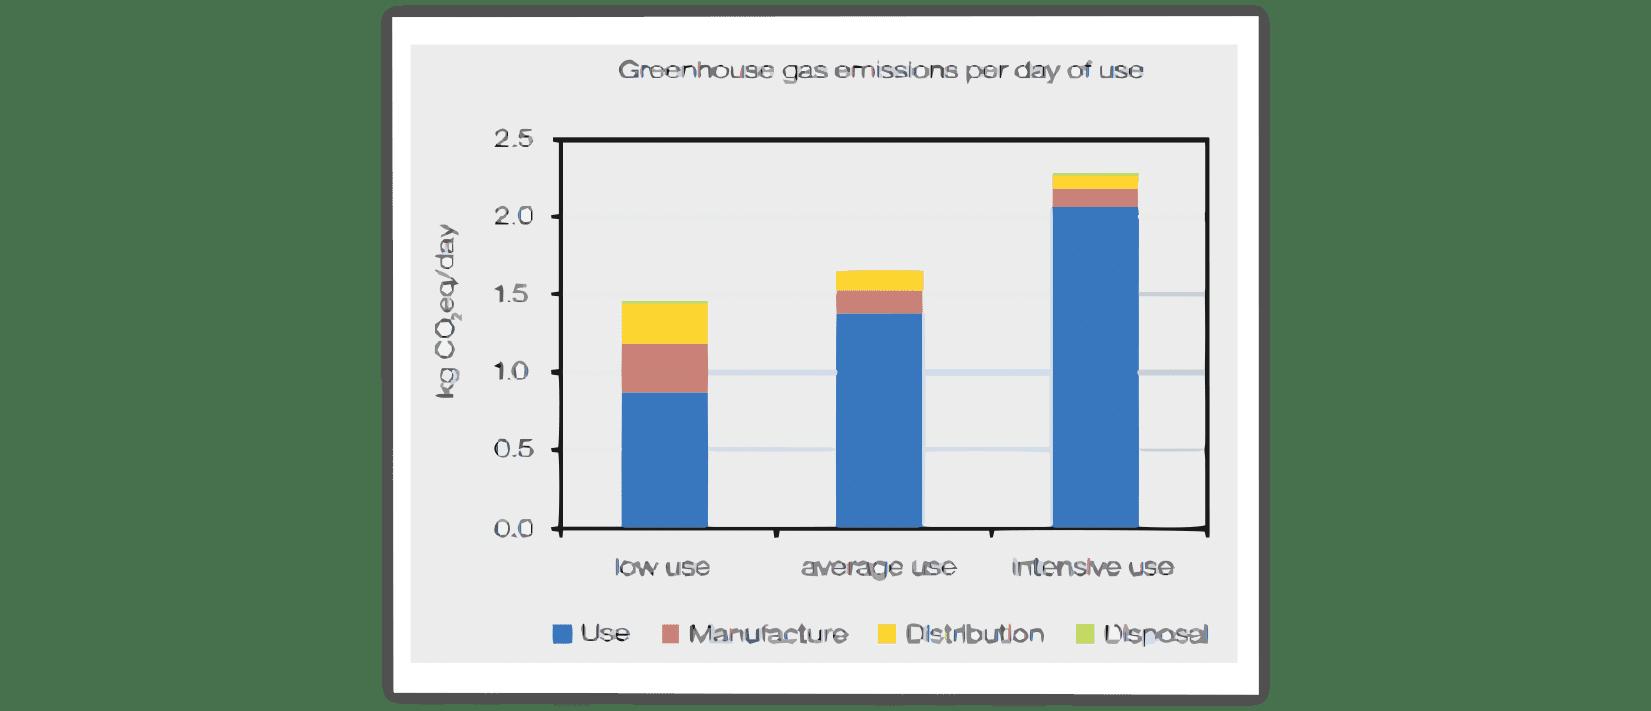 rotary evaporator, rotavapor, distillation, greenhouse emissions, energy